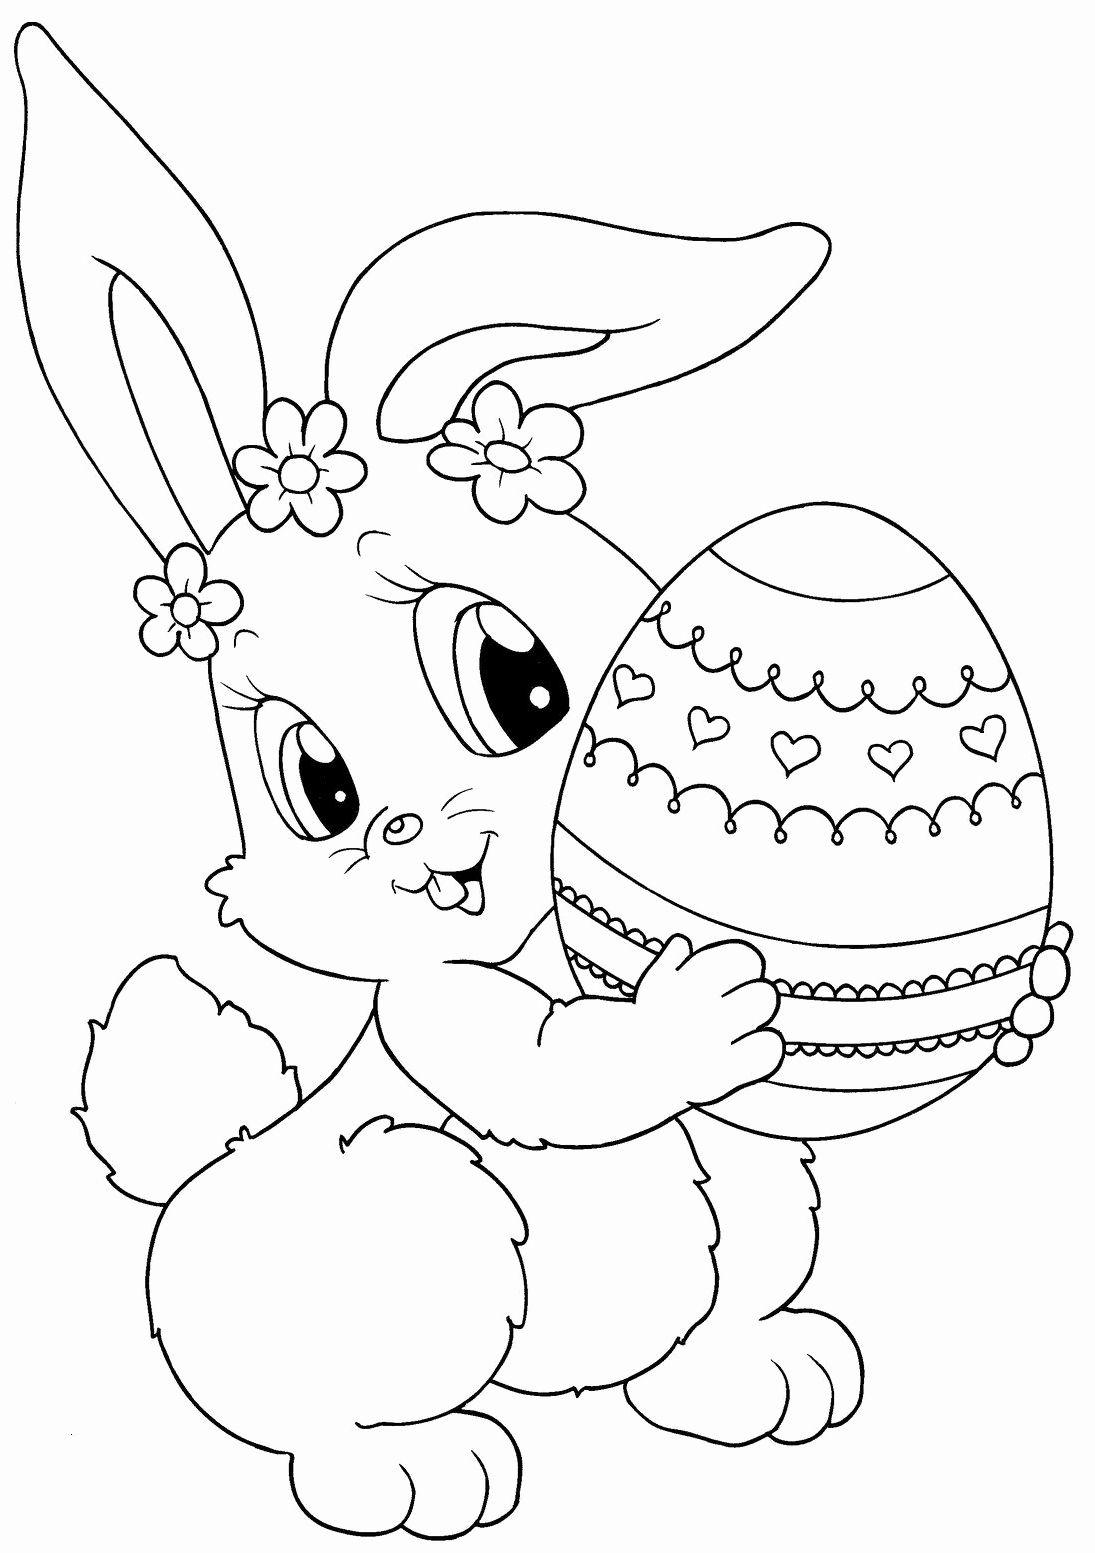 Dttk Kids Animal Coloring Pages Desenhos Para Colorir Natal Desenhos Infantis Para Pintar Artes E Oficios